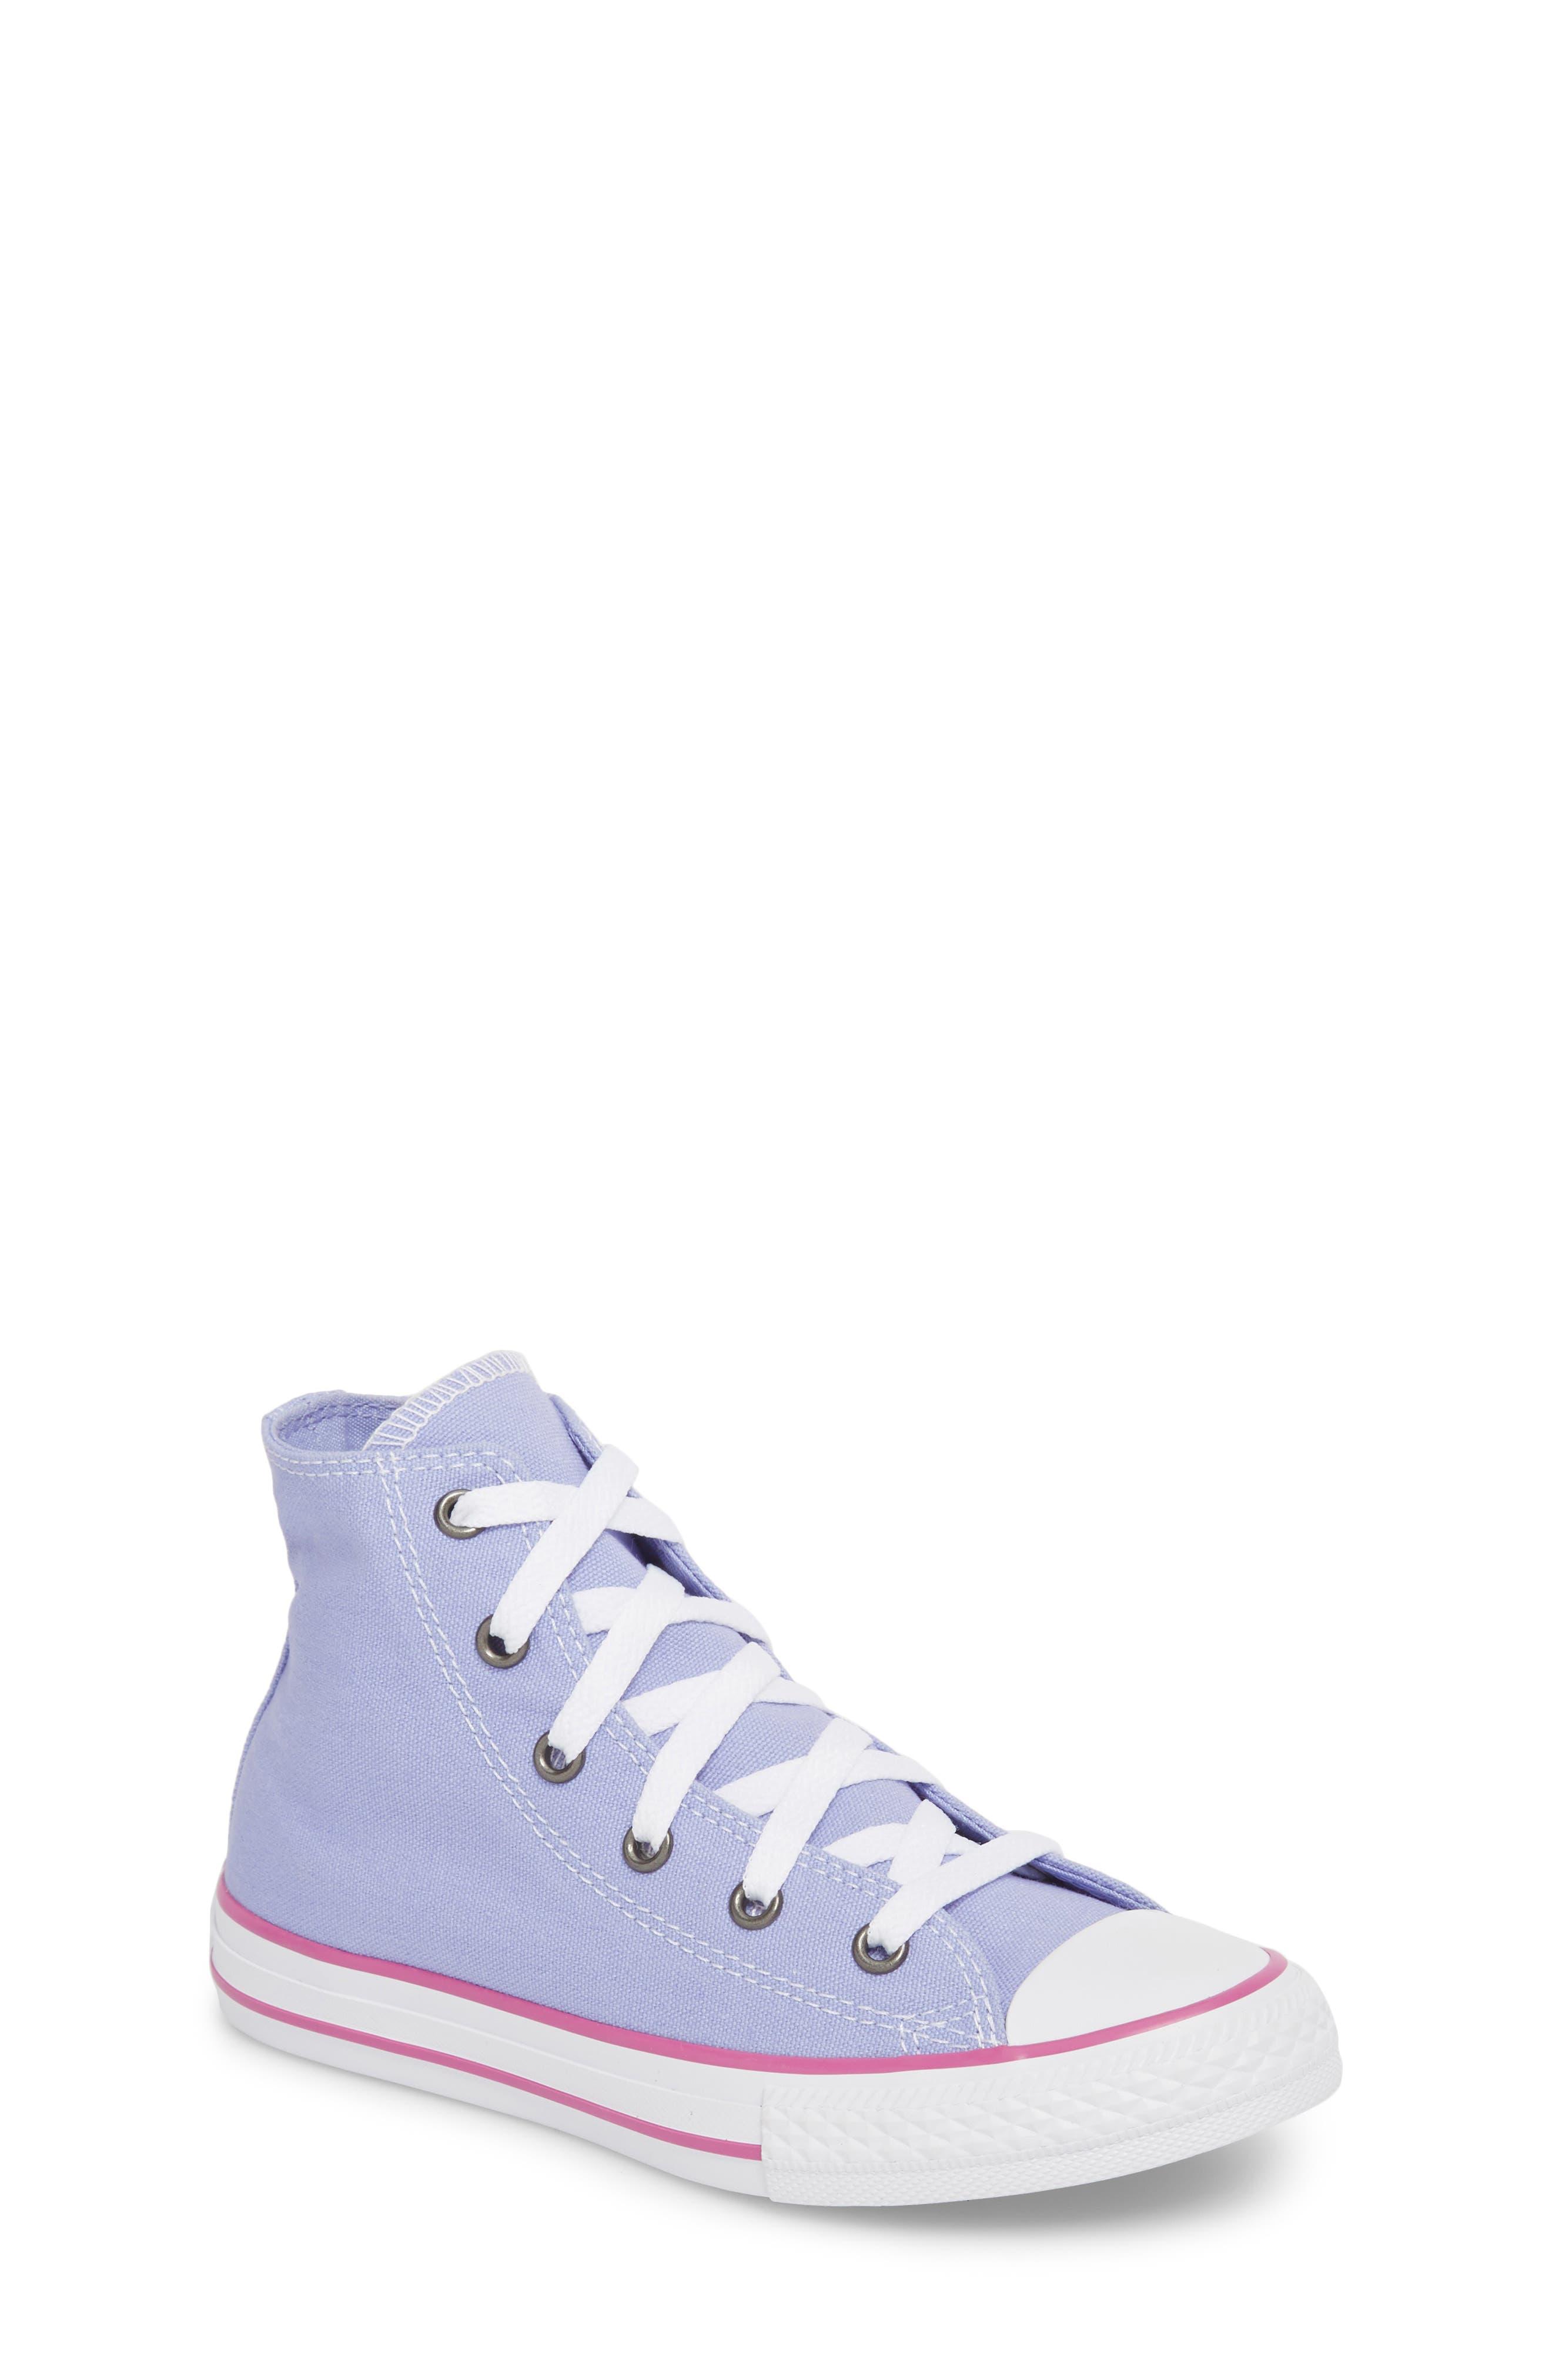 Converse Chuck Taylor® All Star® High Top Sneaker (Baby, Walker, Toddler, Little Kid & Big Kid)